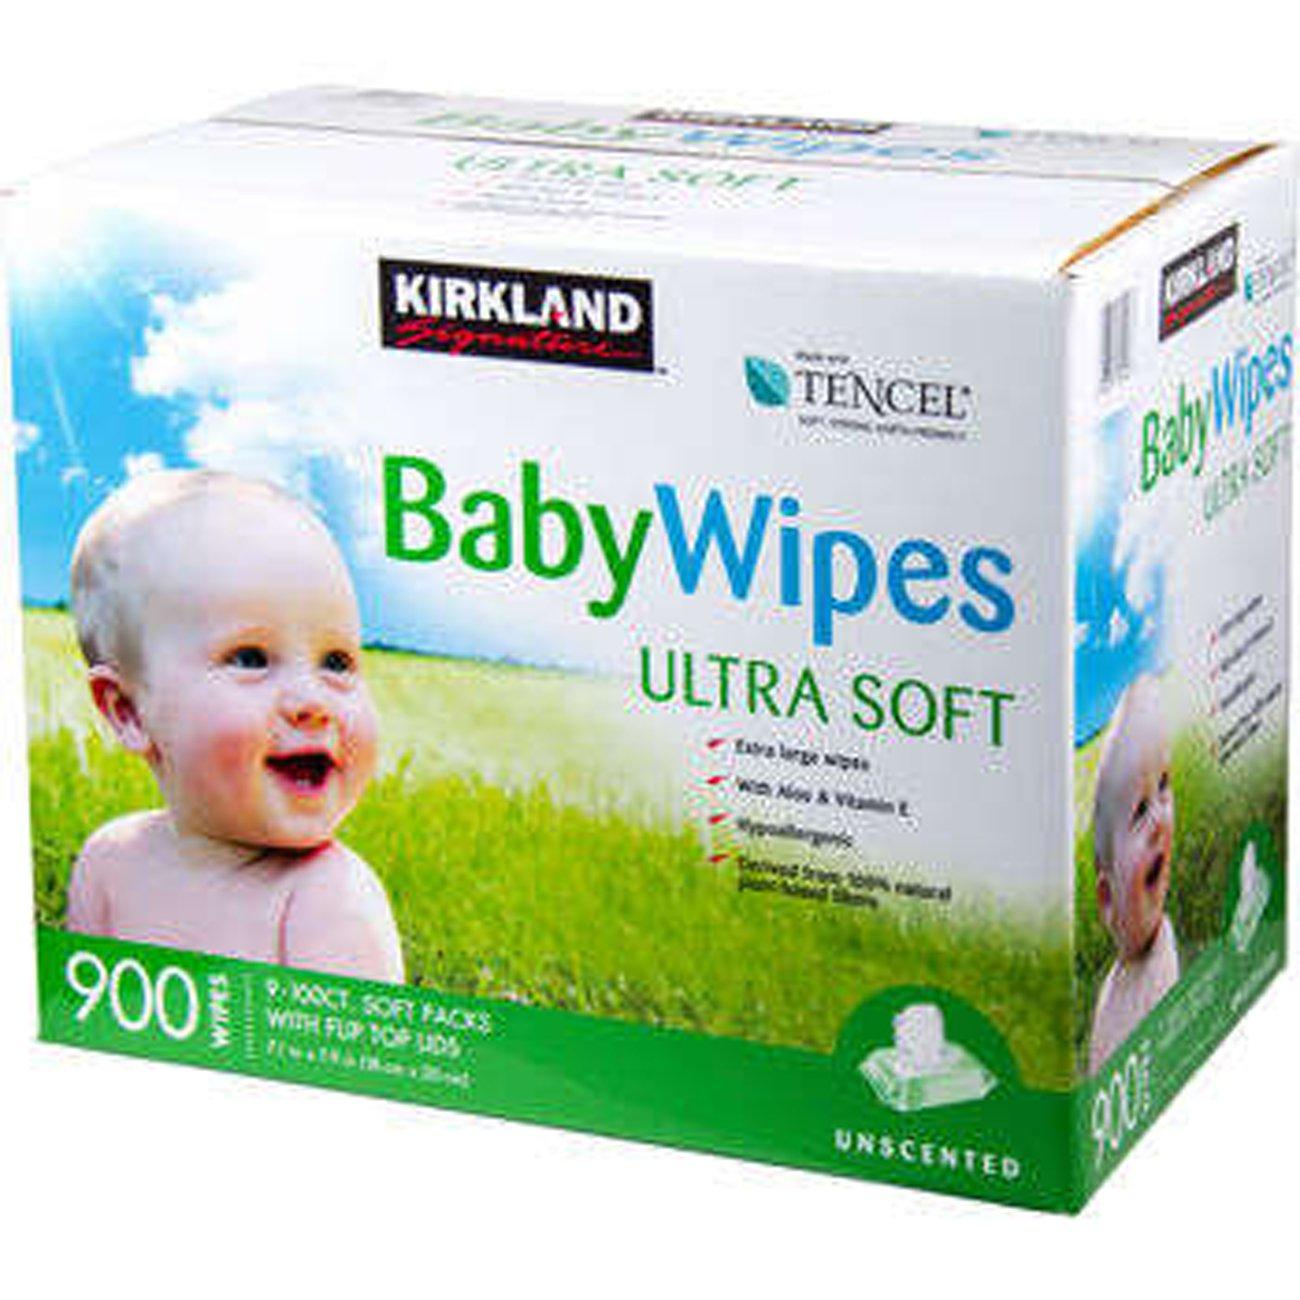 Kirkland Signature™ Baby Wipes 900ct.